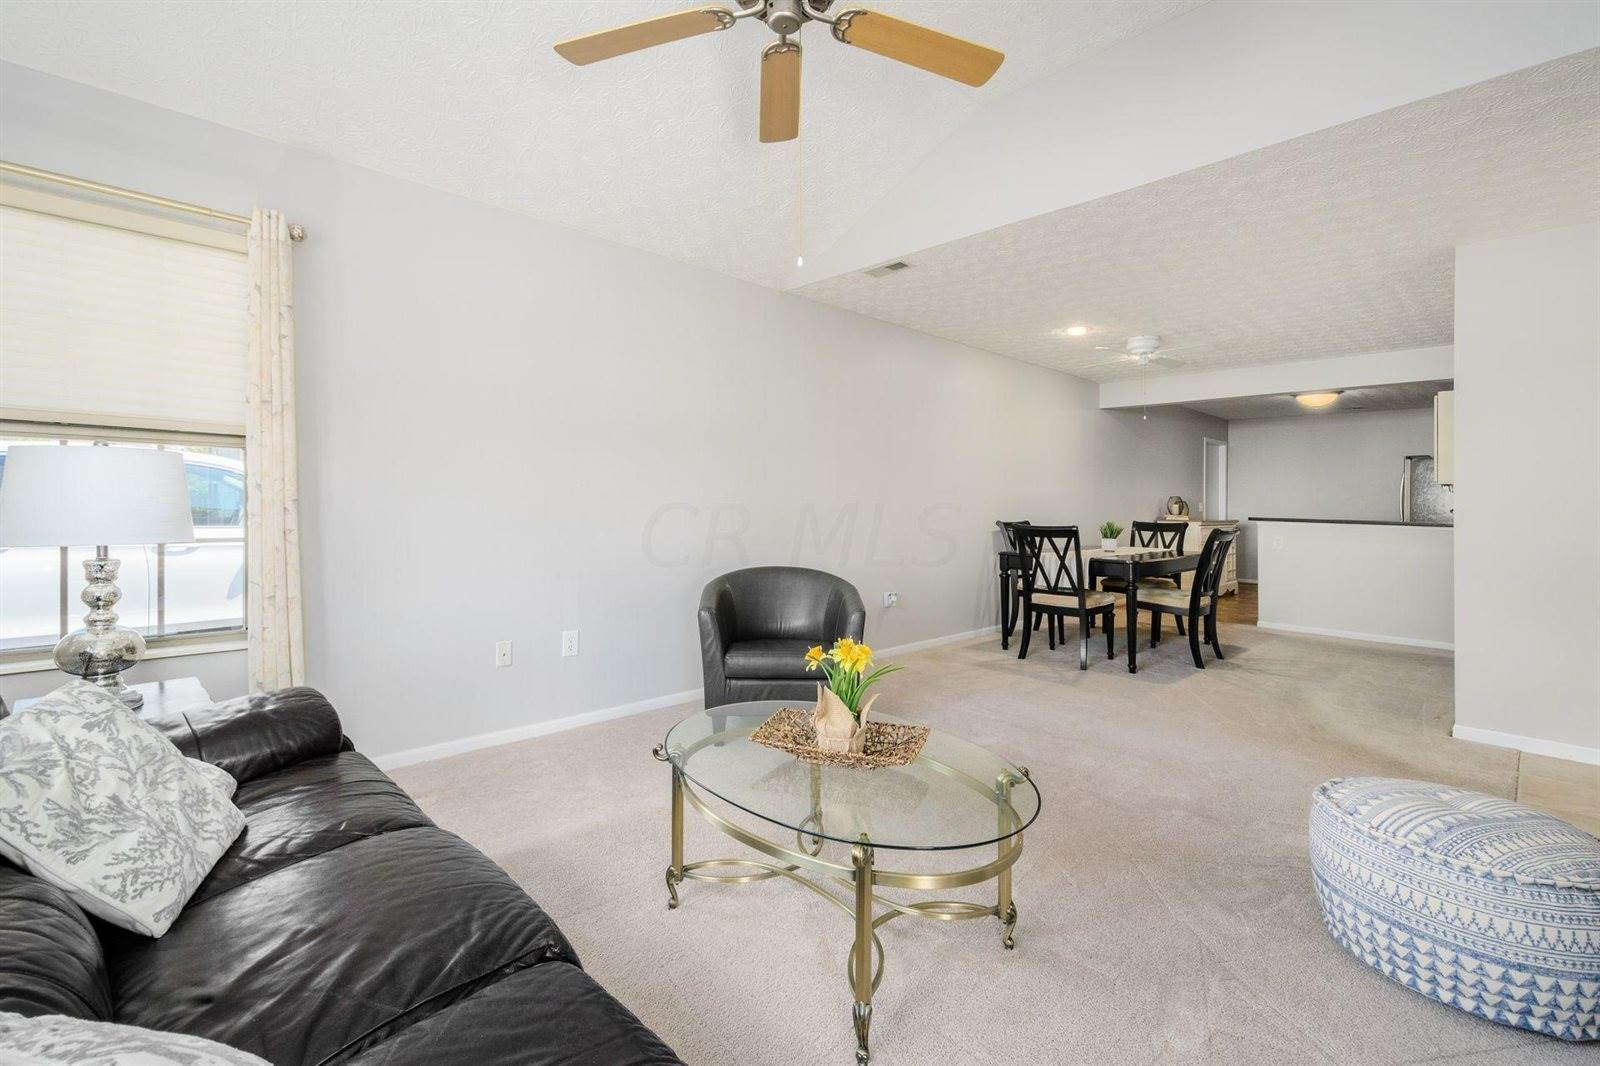 8517 Stonewoods Lane, Powell, OH 43065